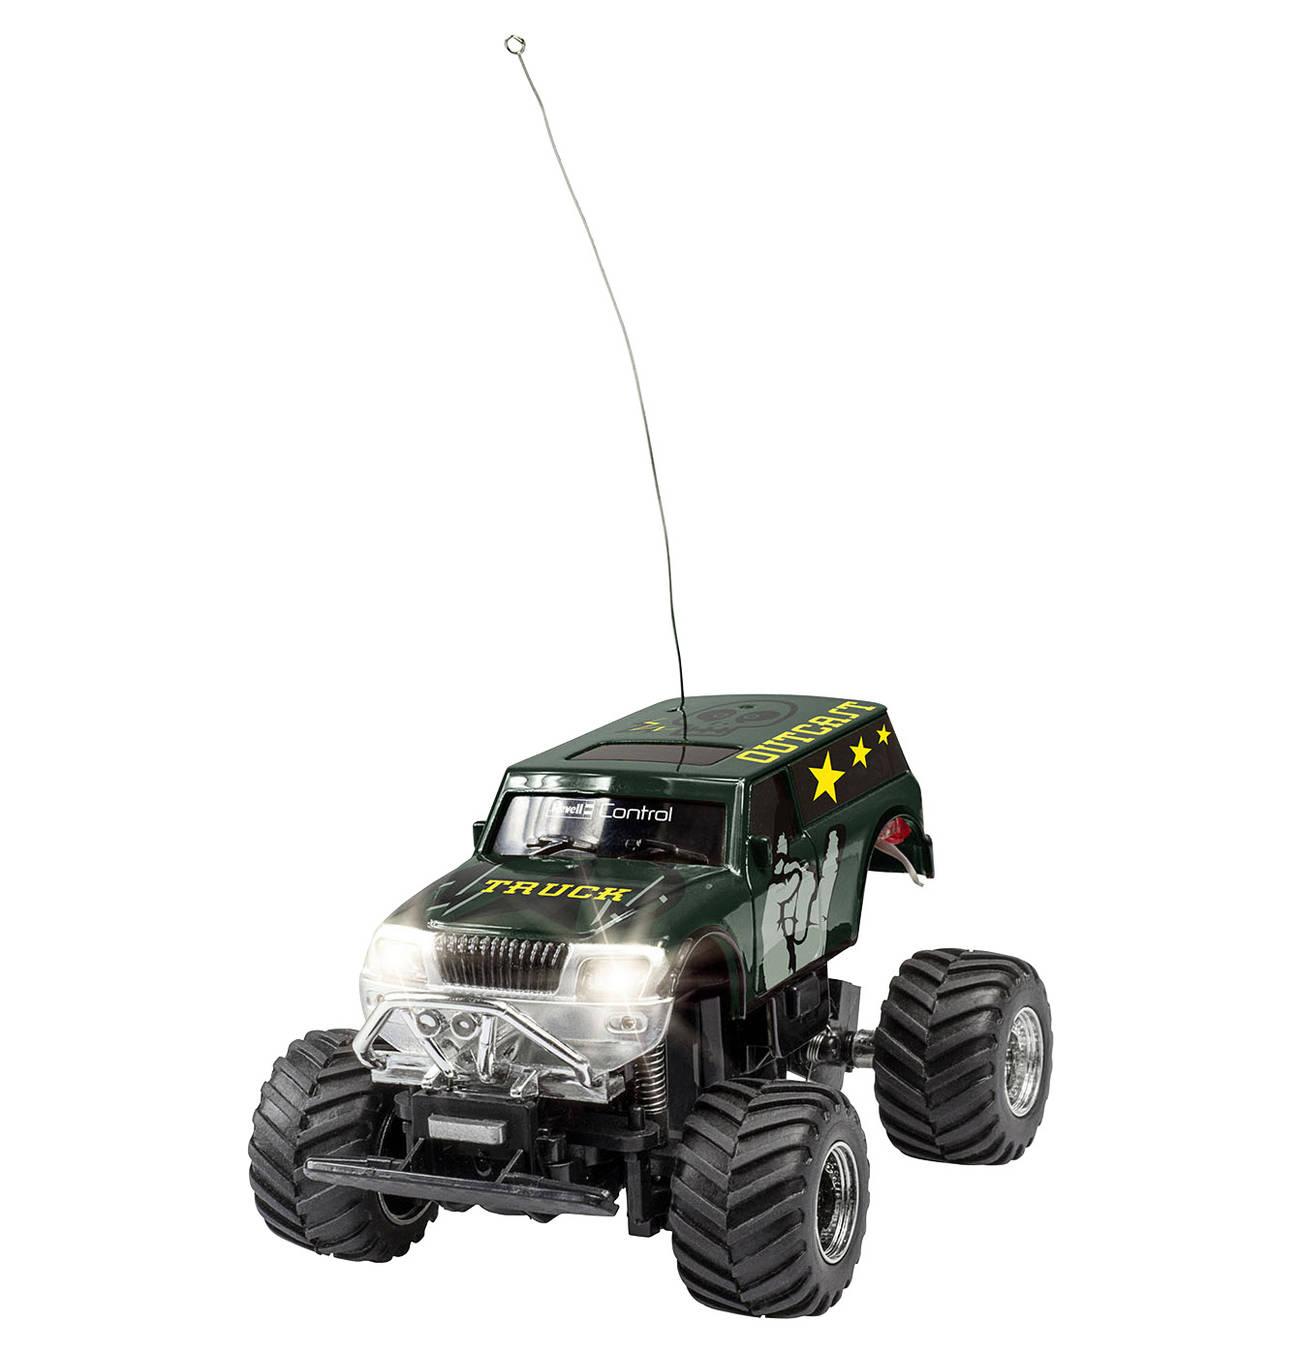 Mini Rc Truck Outcast 2ch 27mhz Controller Rc Autos Fahrzeuge Hinterachse